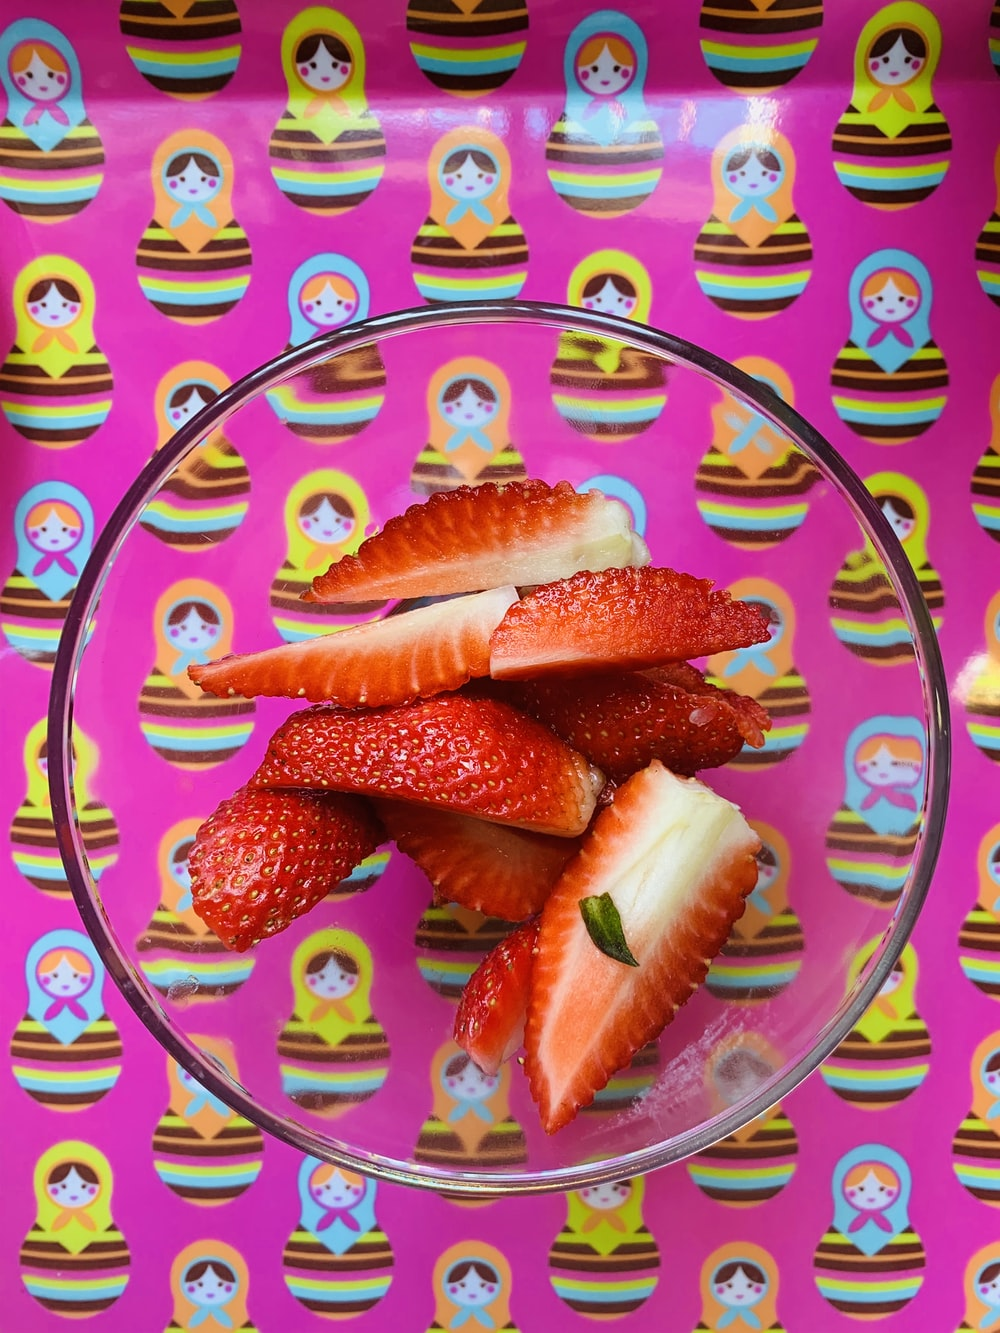 sliced orange fruit on purple and white ceramic plate